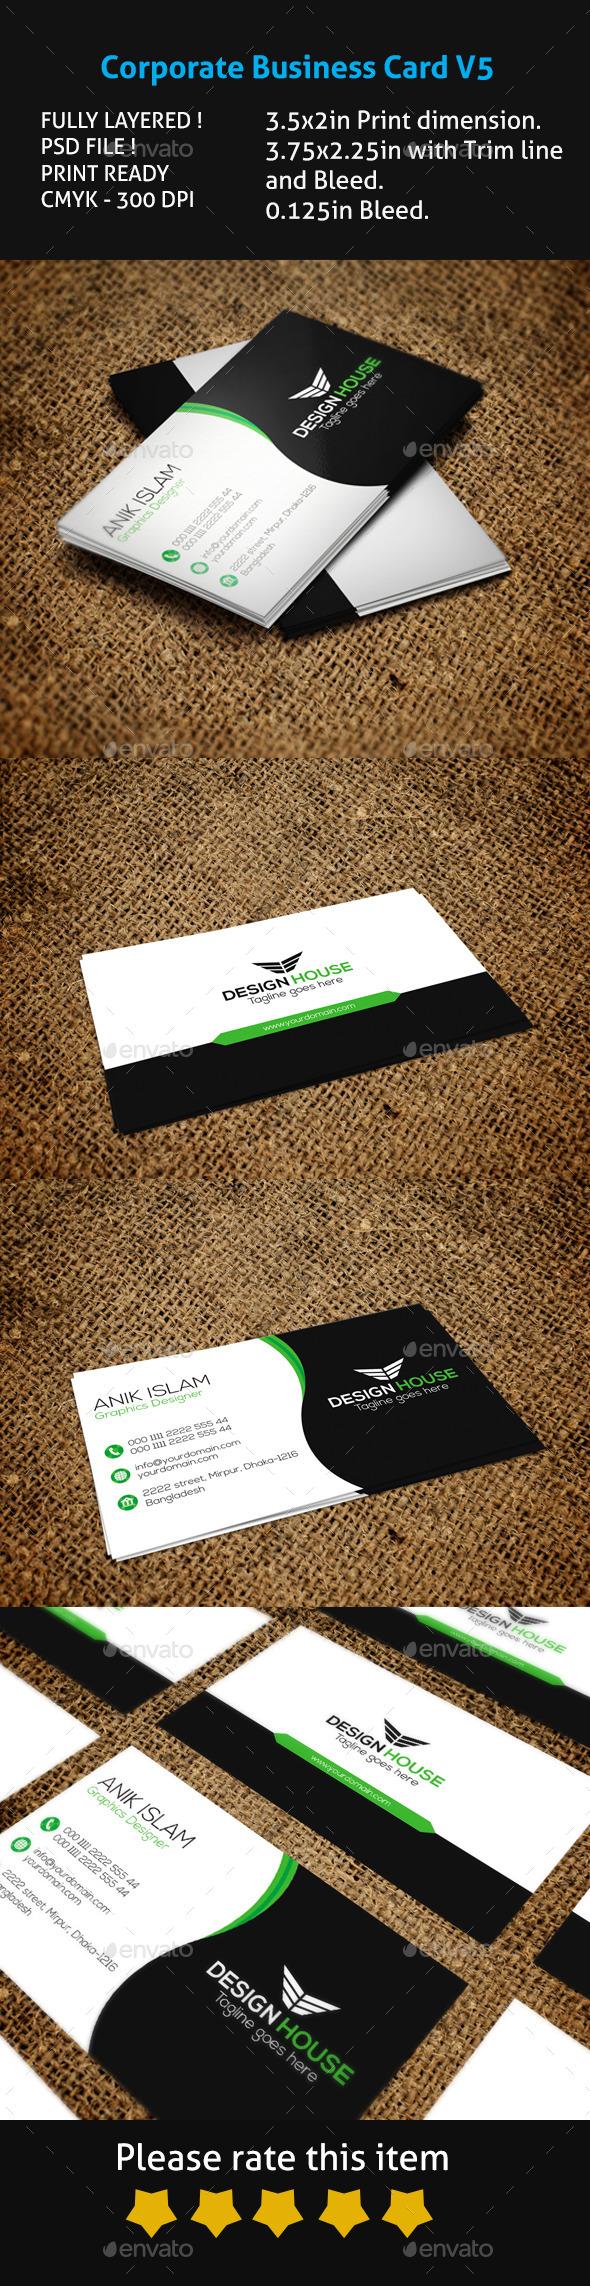 GraphicRiver Corporate Business Card V5 11876701